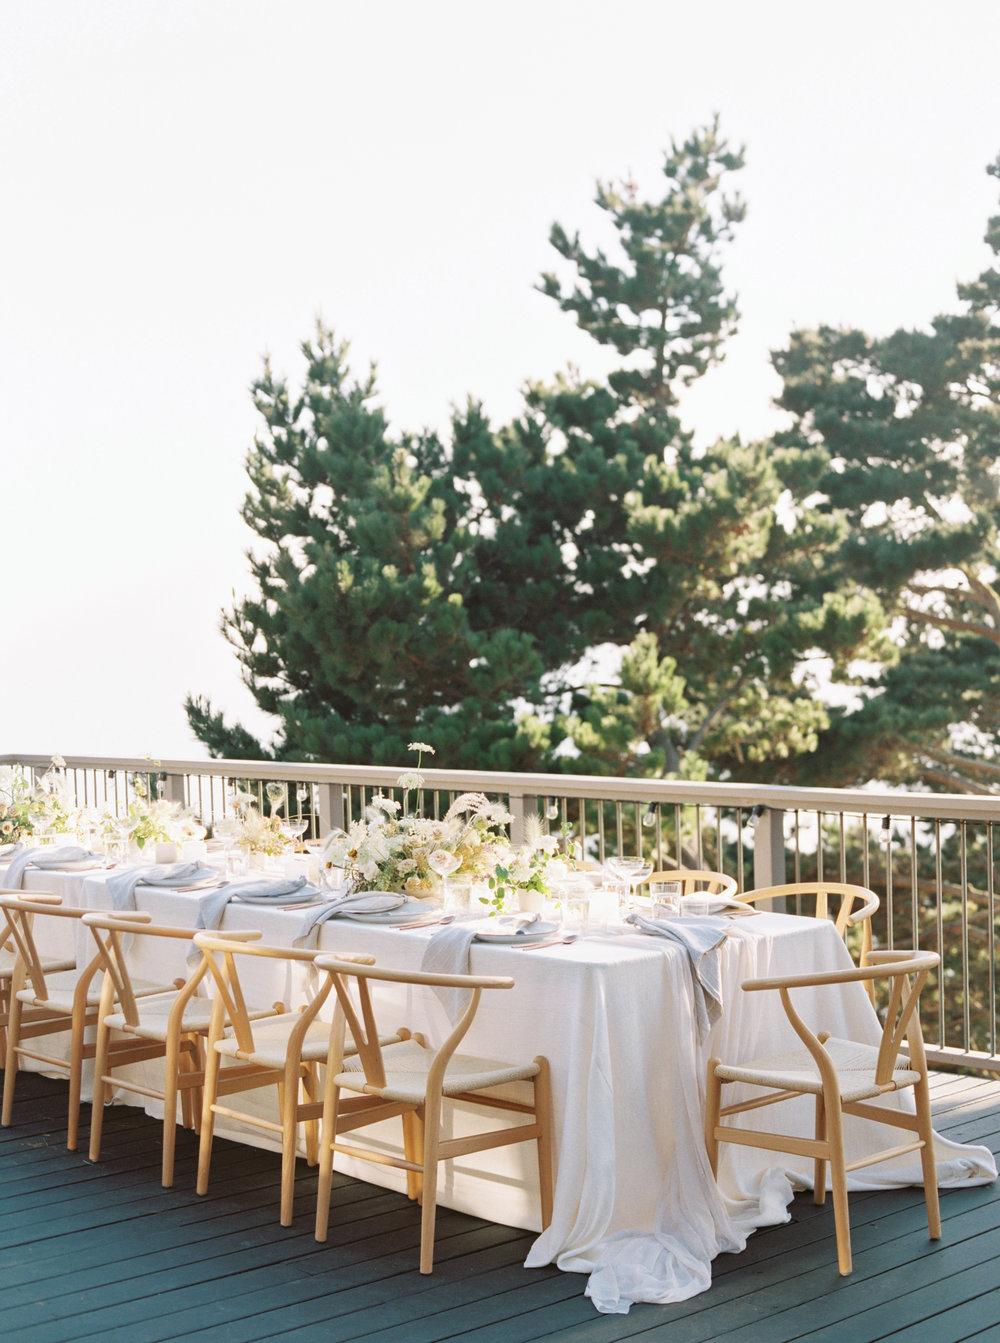 12th-Table-BIG-SUR-WEDDING-Erich-McVey-16